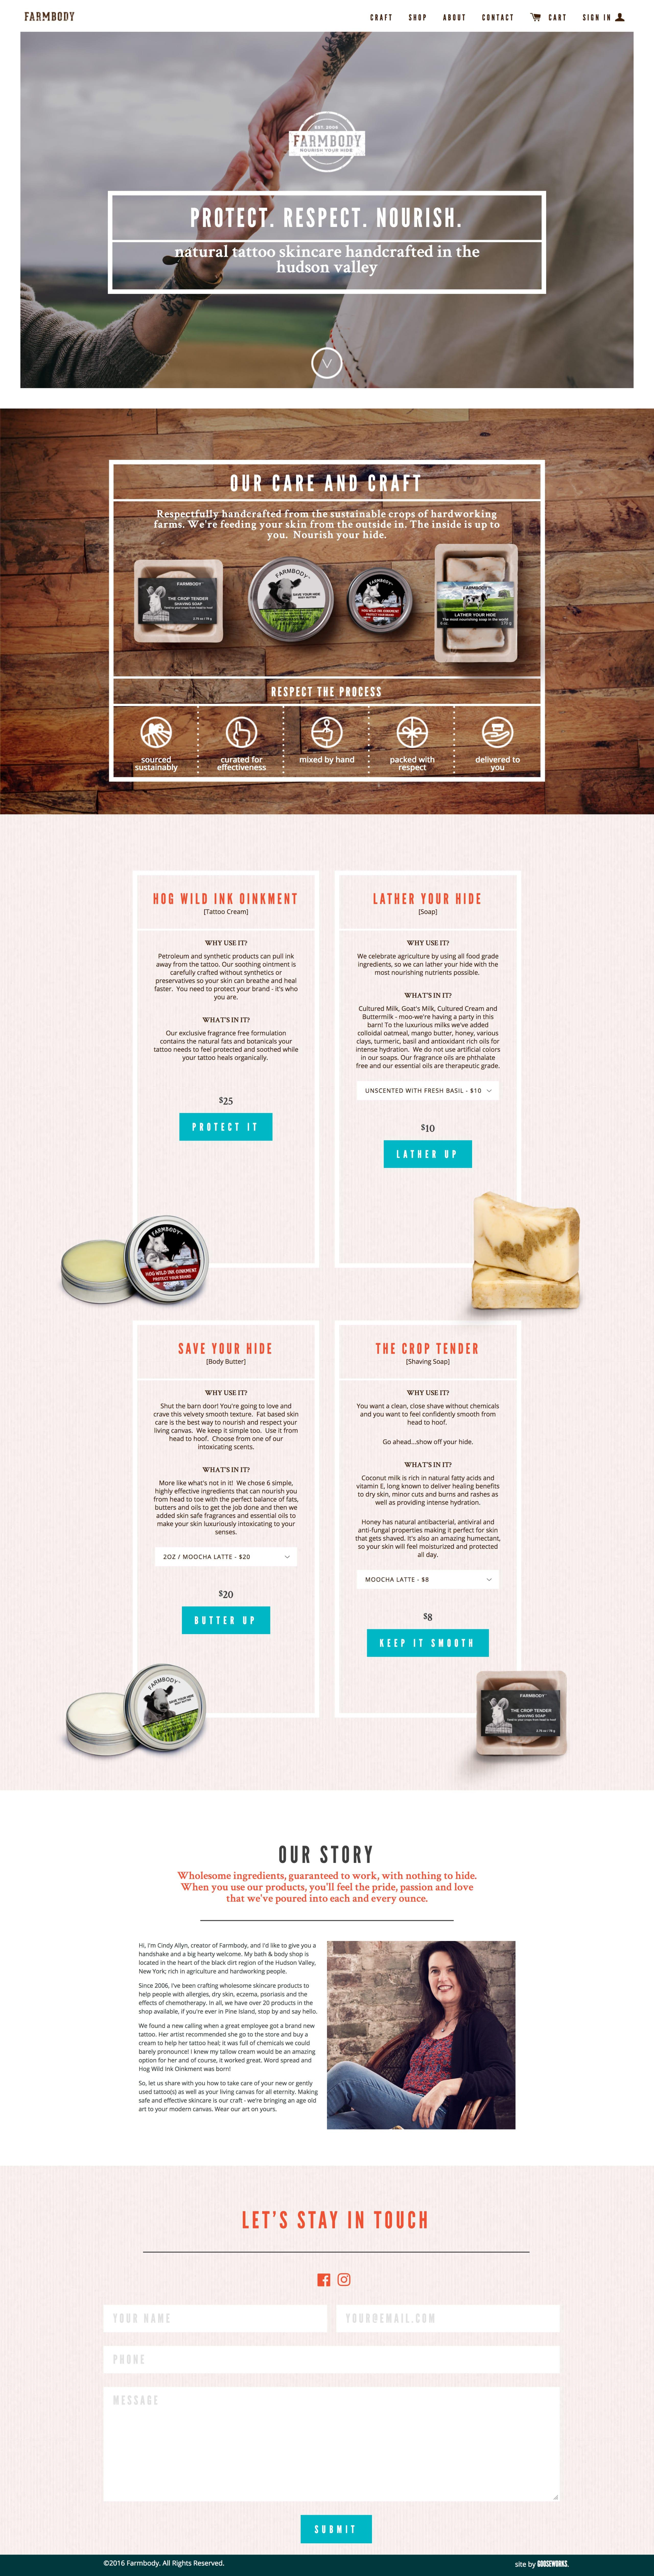 Farmbody Skin Care Website Screenshot